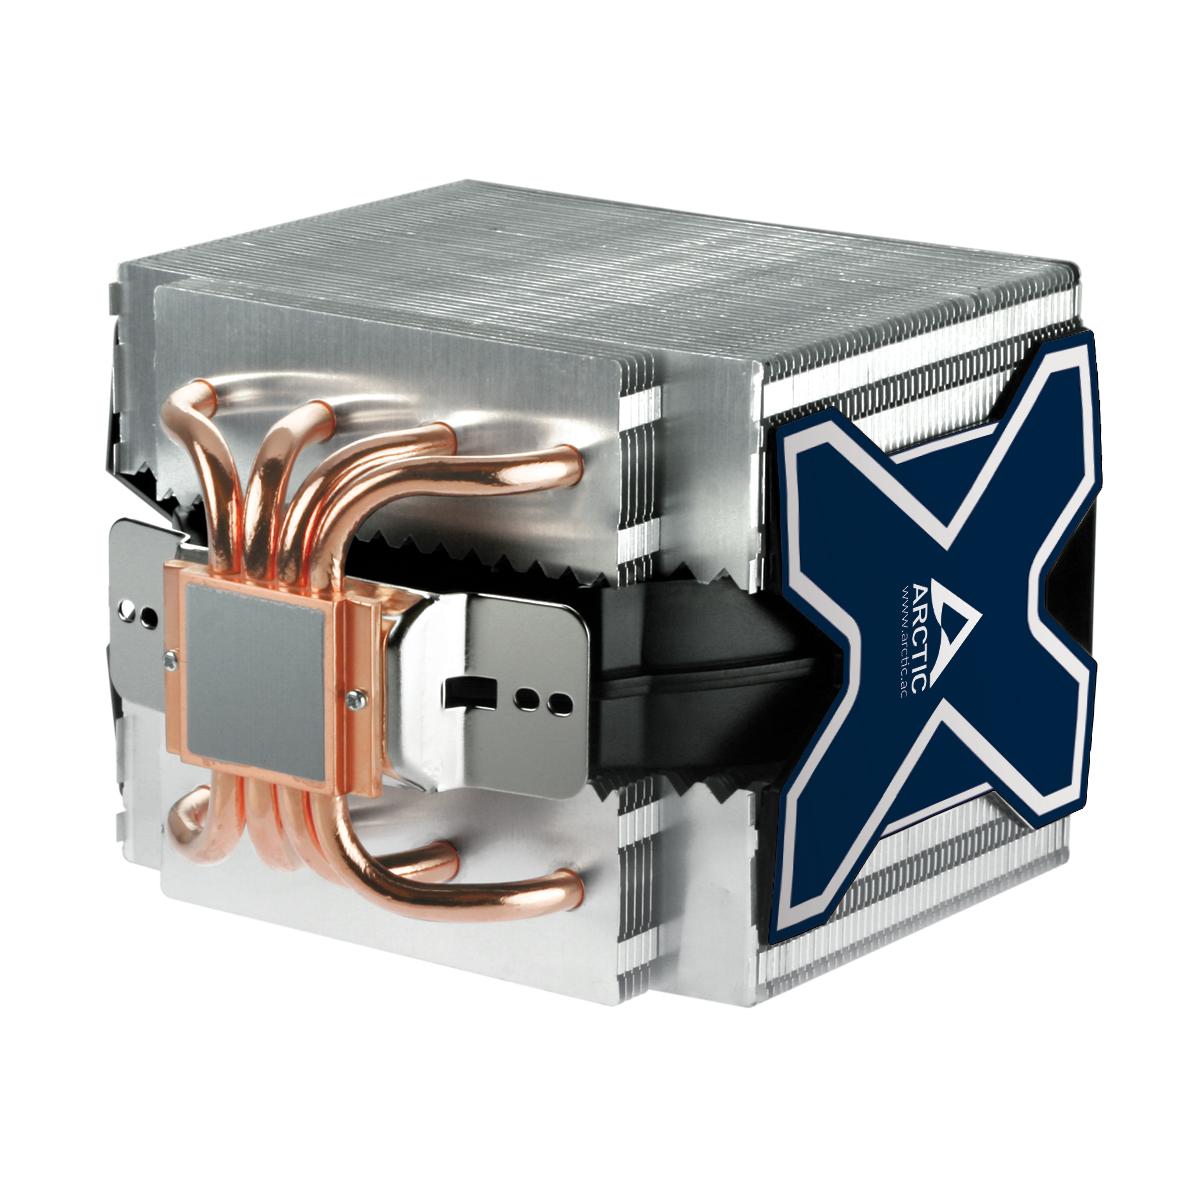 Freezer Xtreme